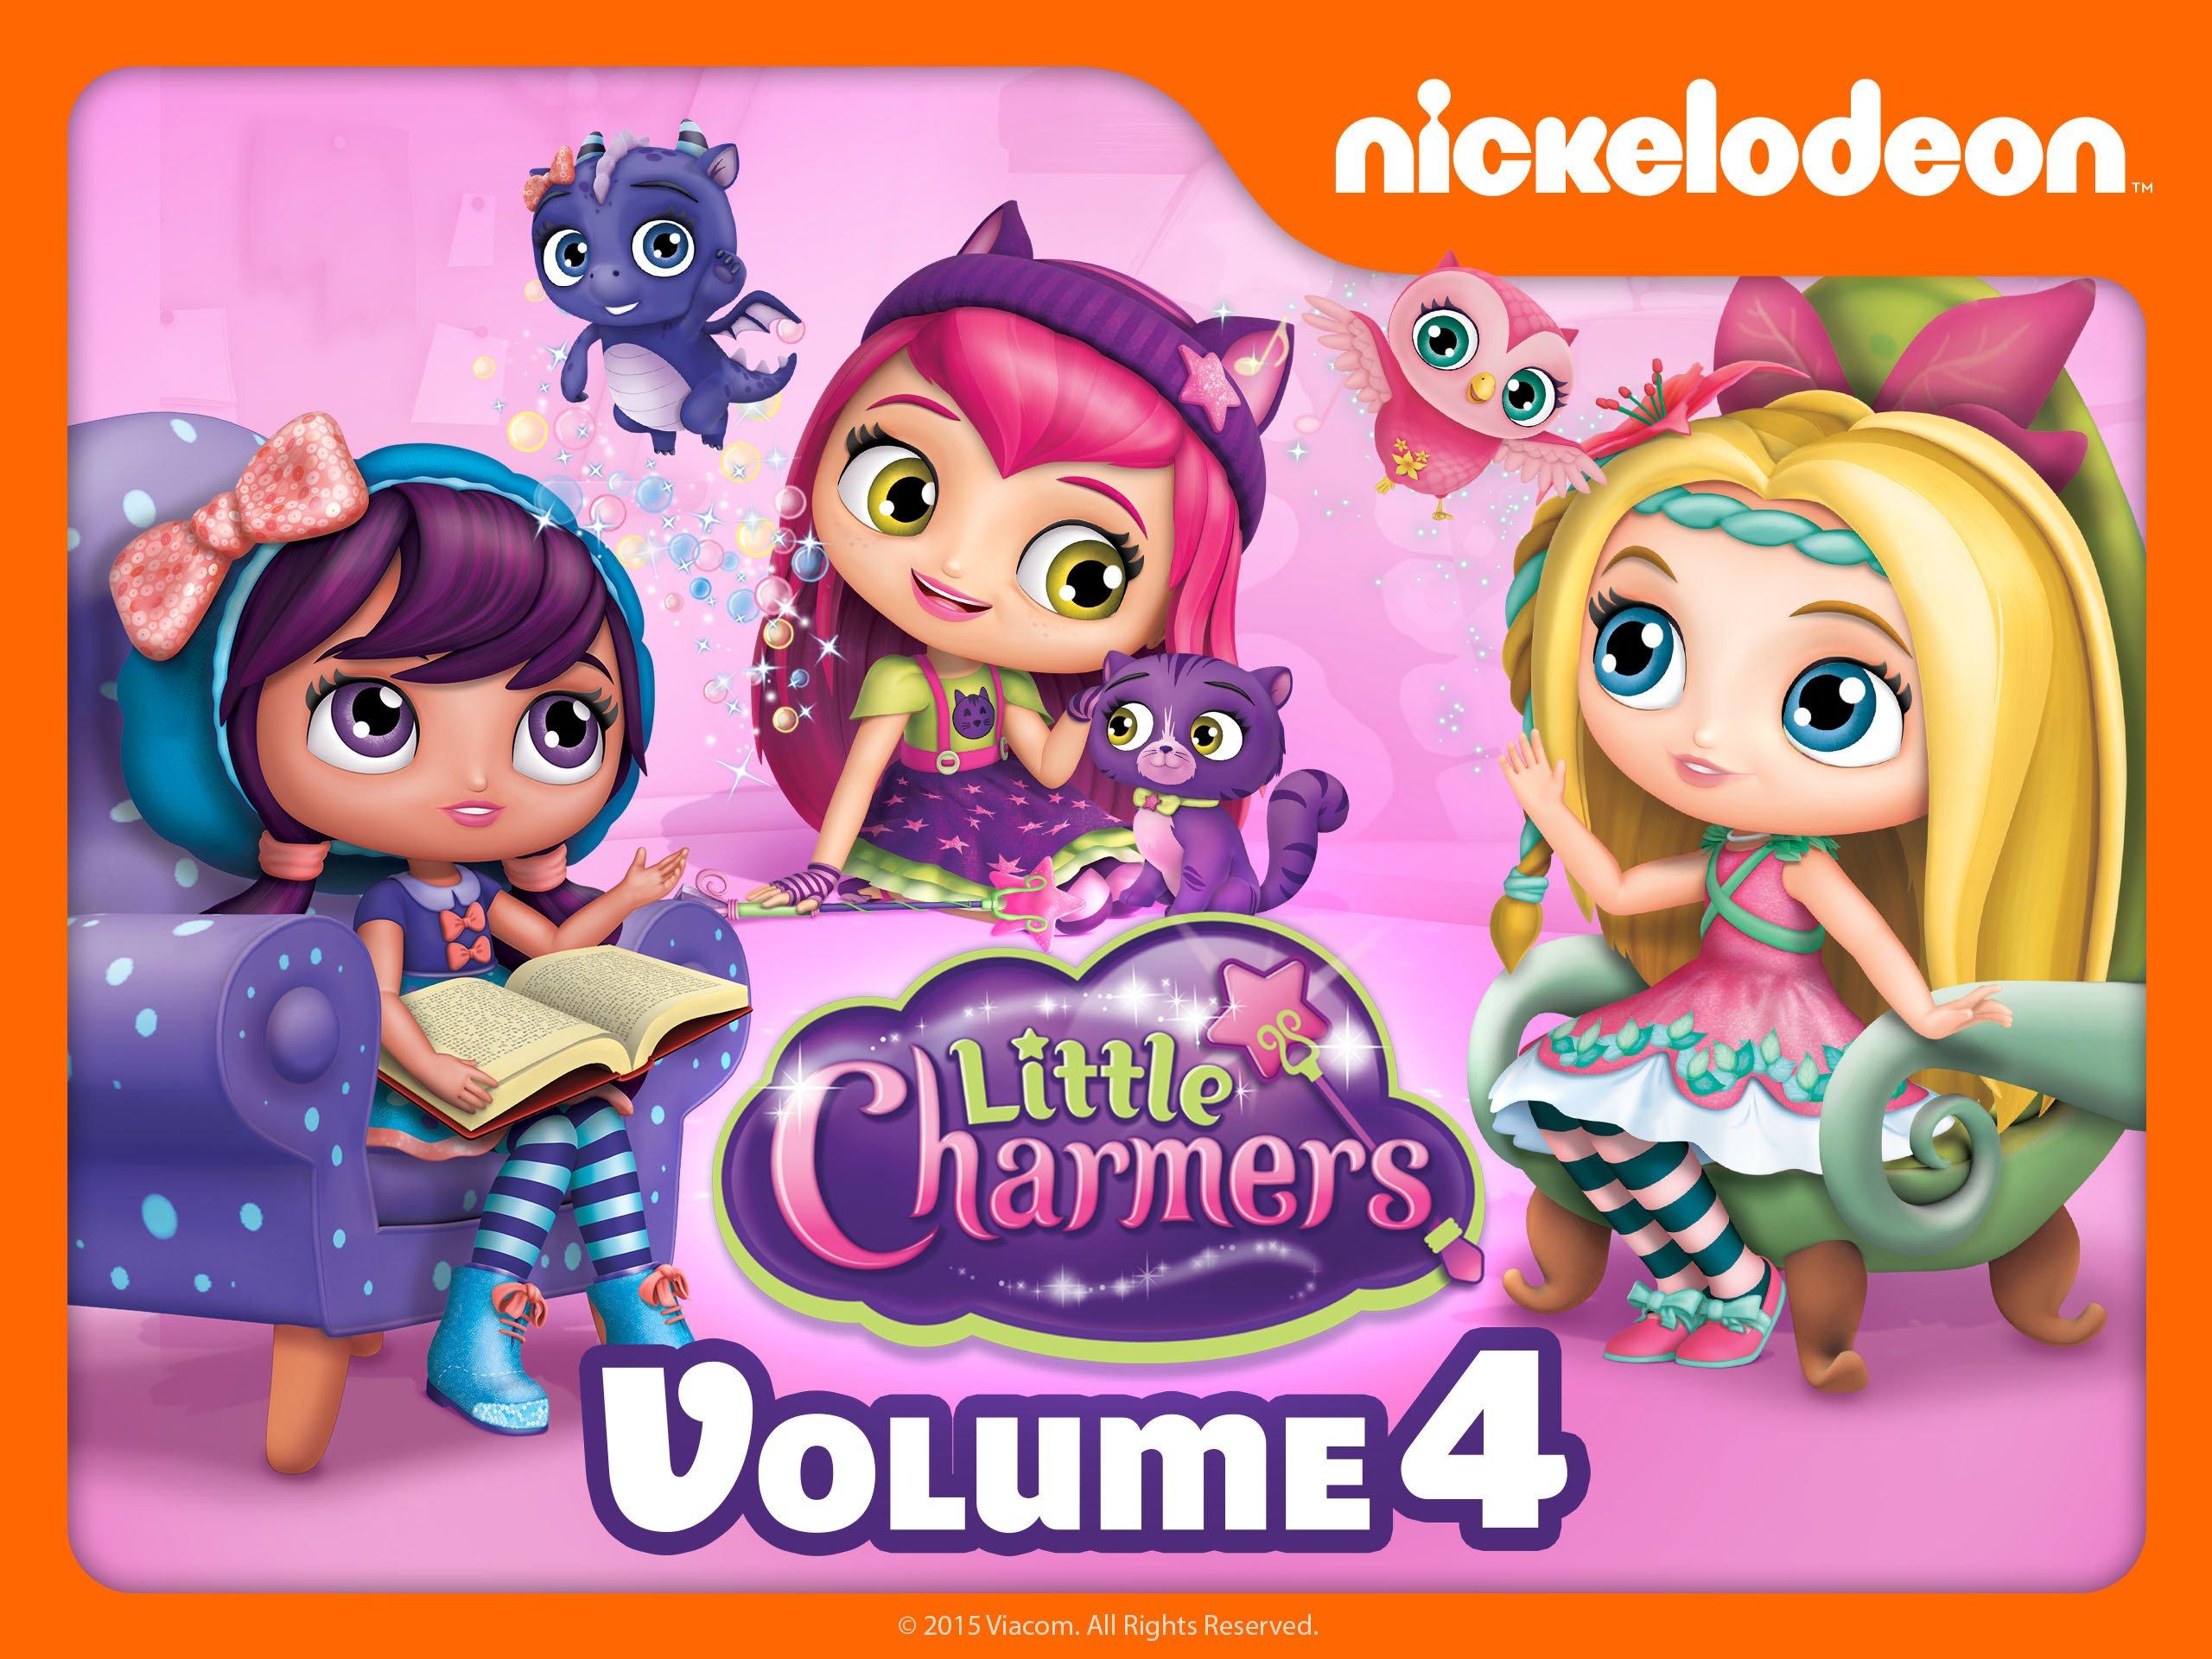 Amazon com: Watch Little Charmers - Volume 4 | Prime Video